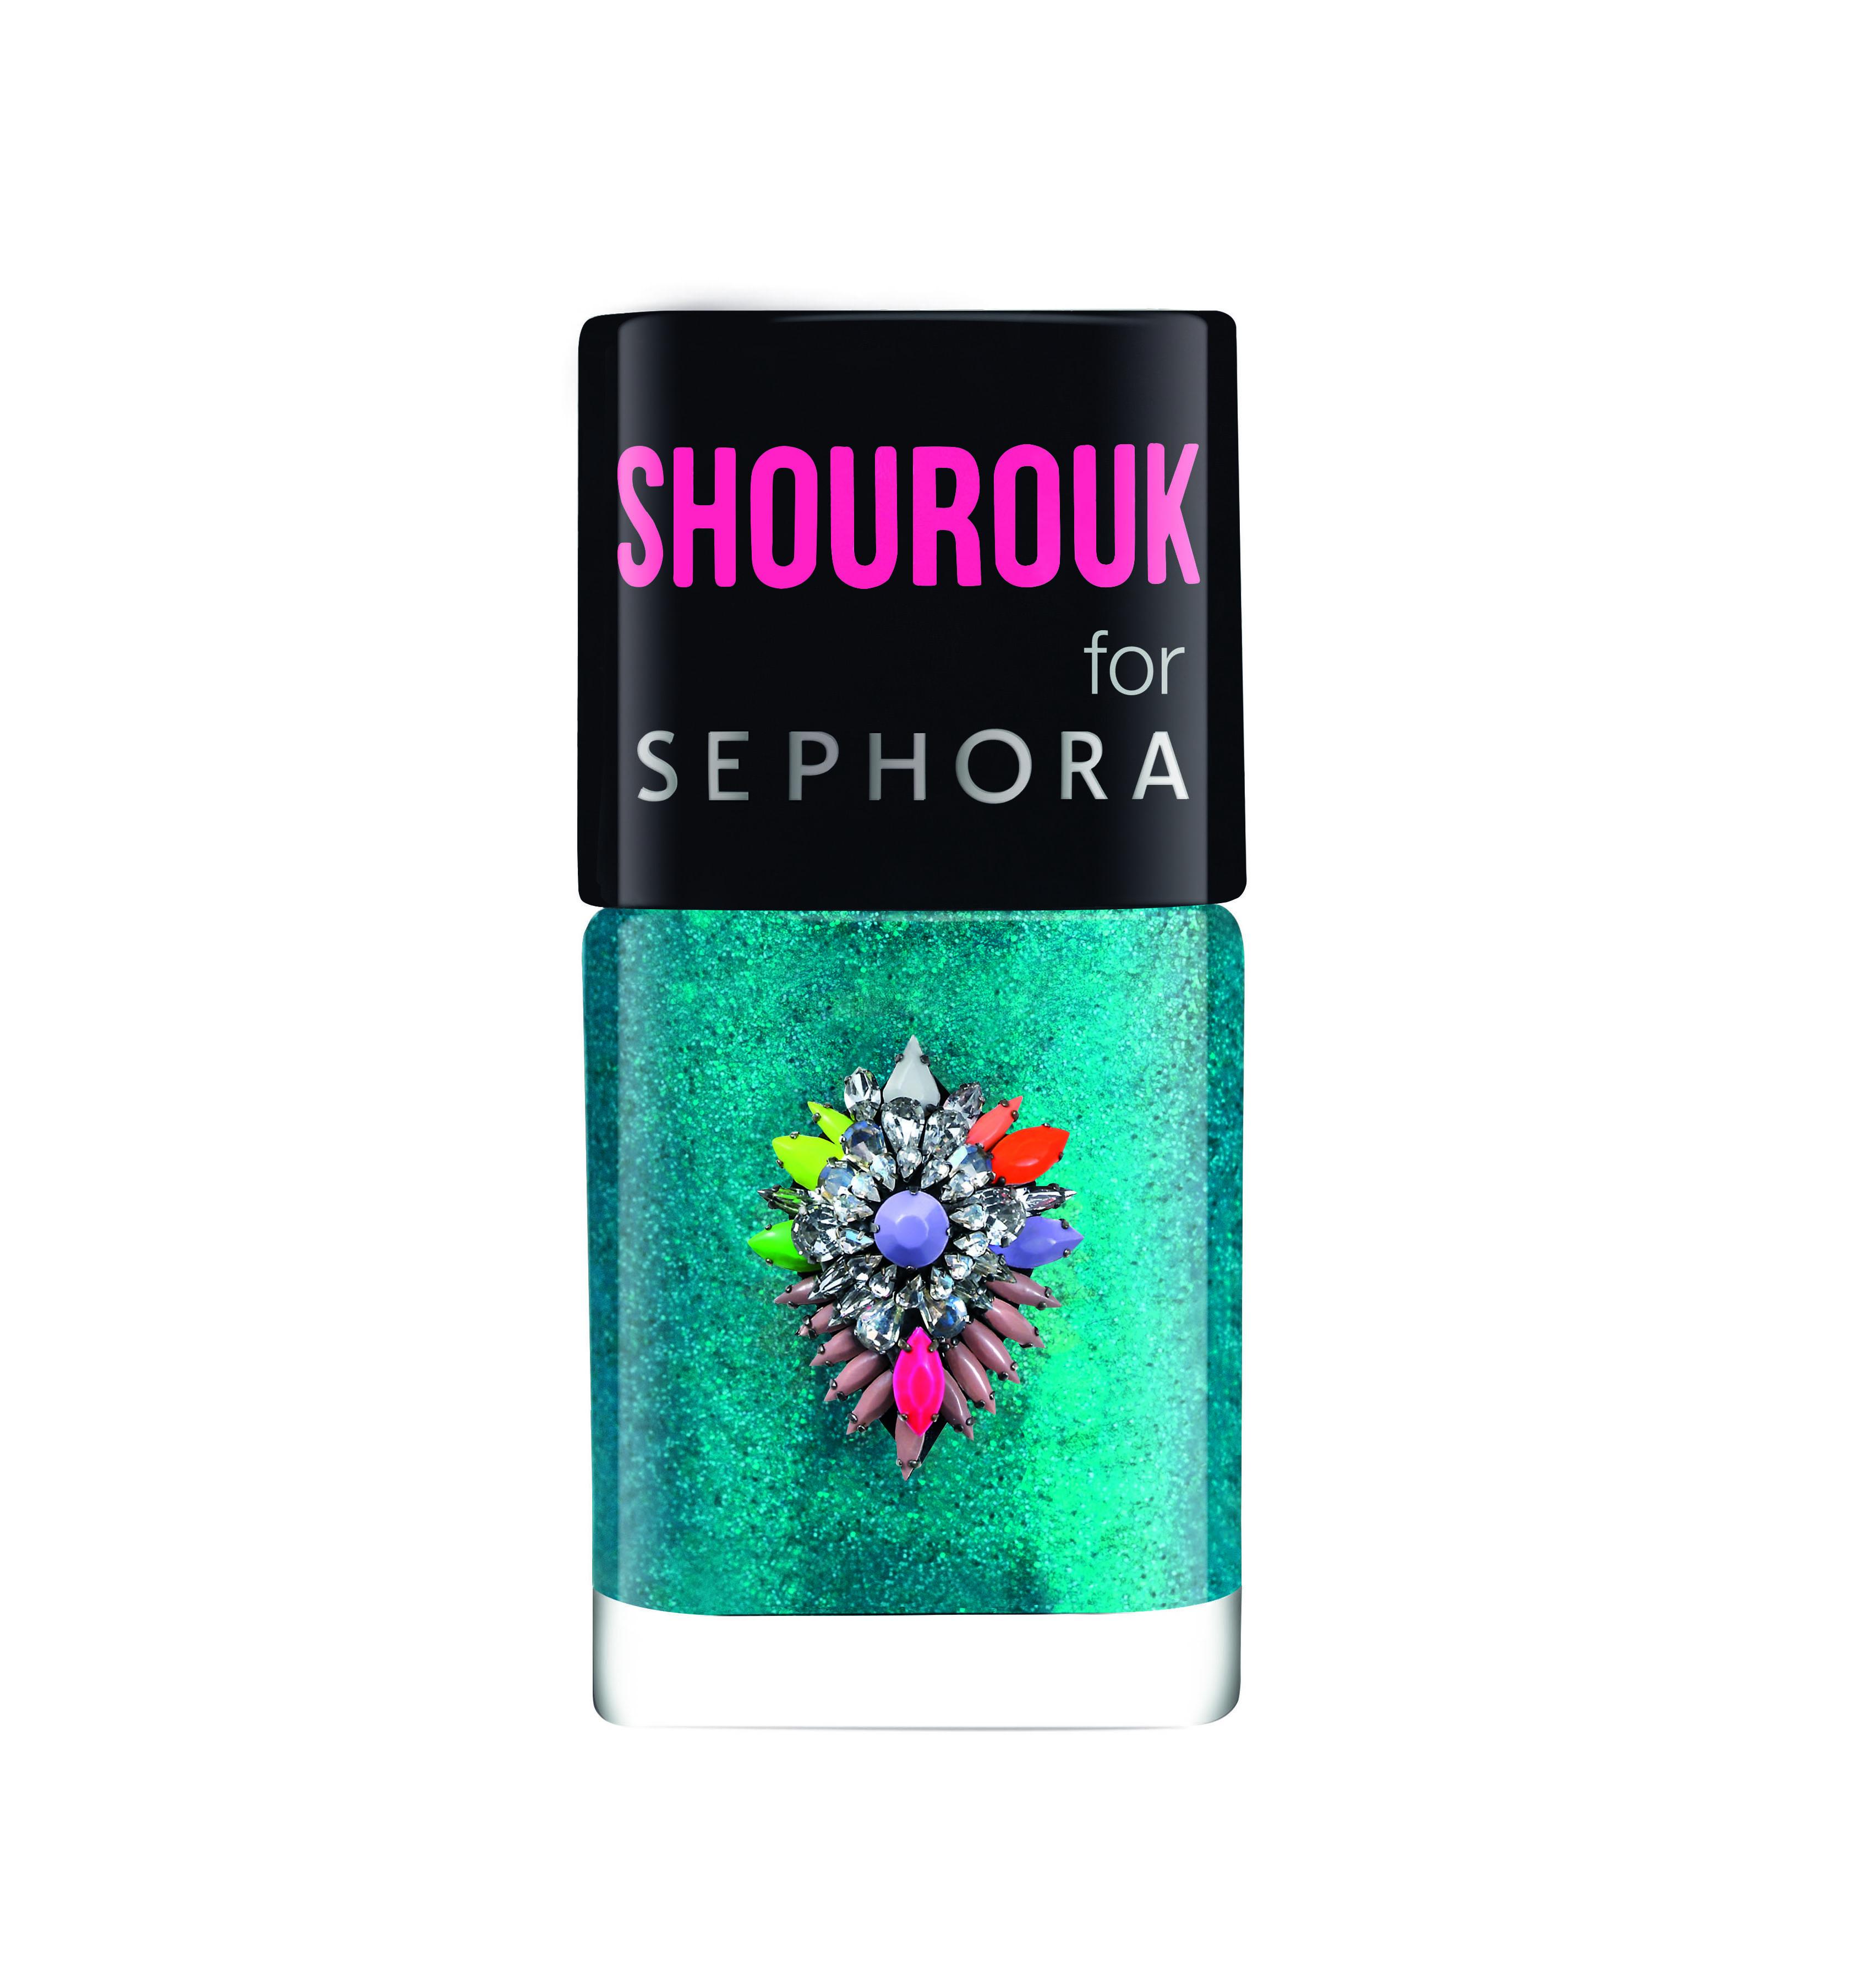 smalto sephora shourouk